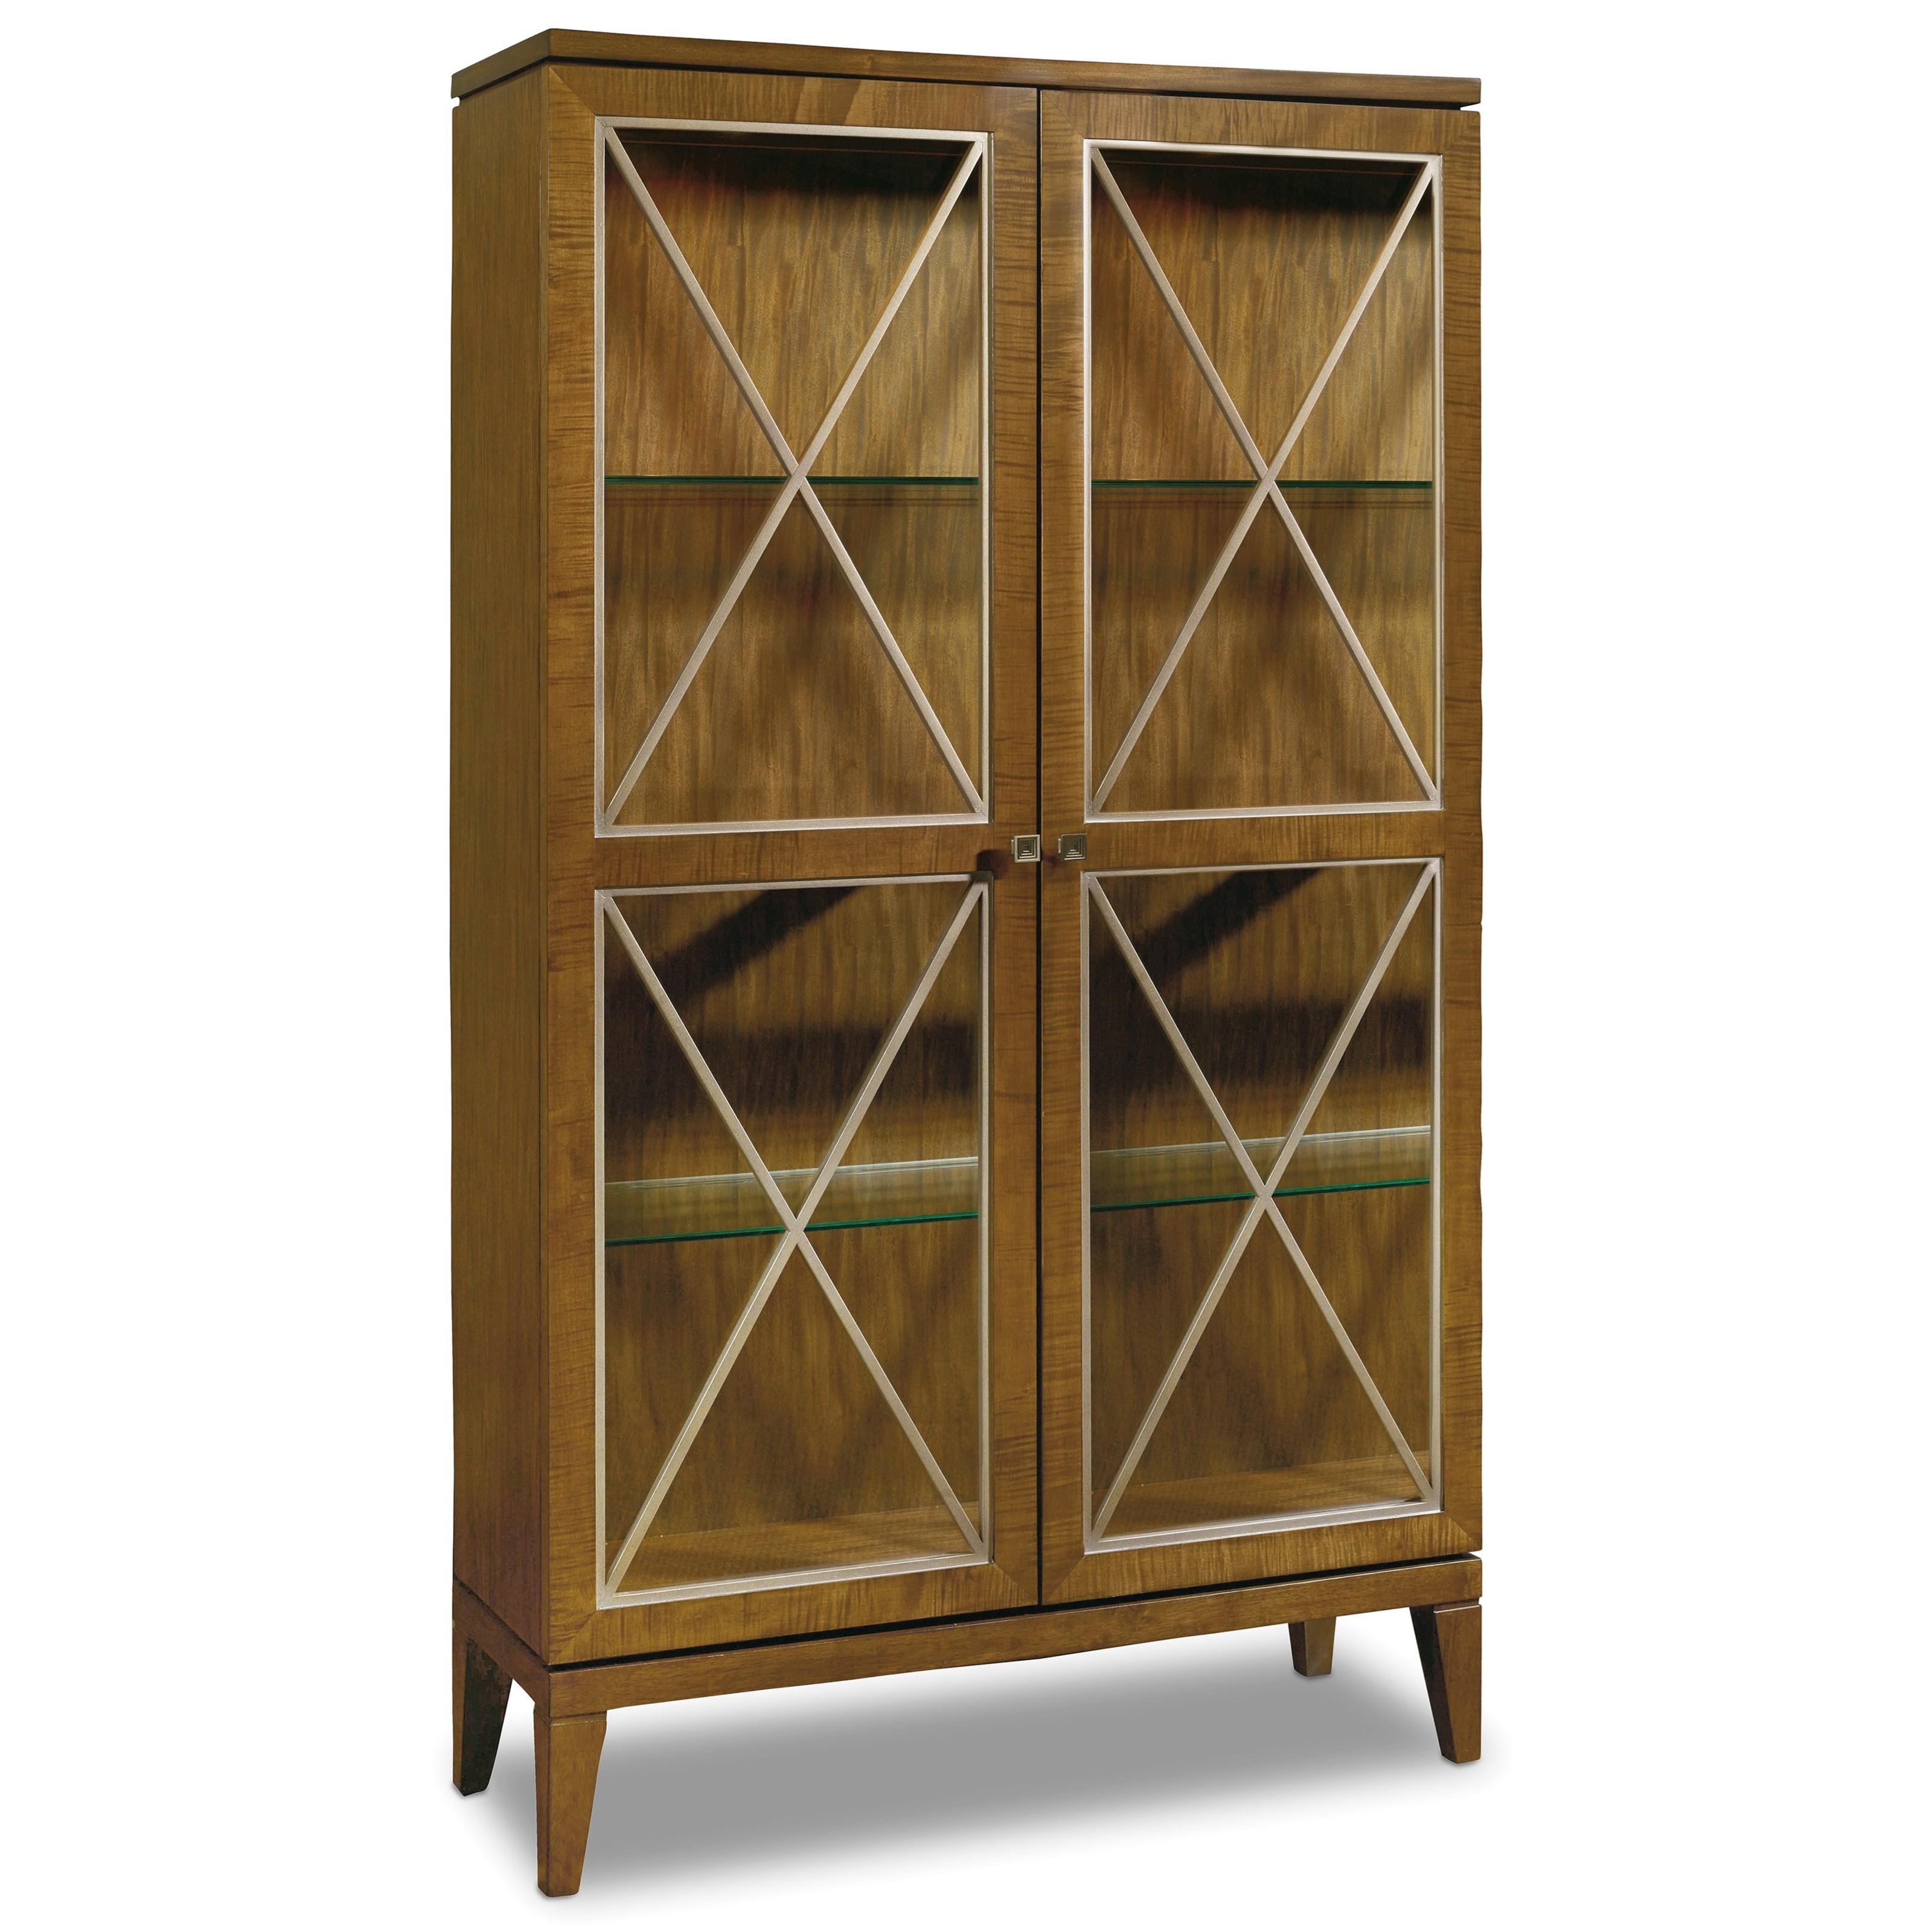 Hooker Furniture Retropolitan Display Cabinet - Item Number: 5510-75906-MWD